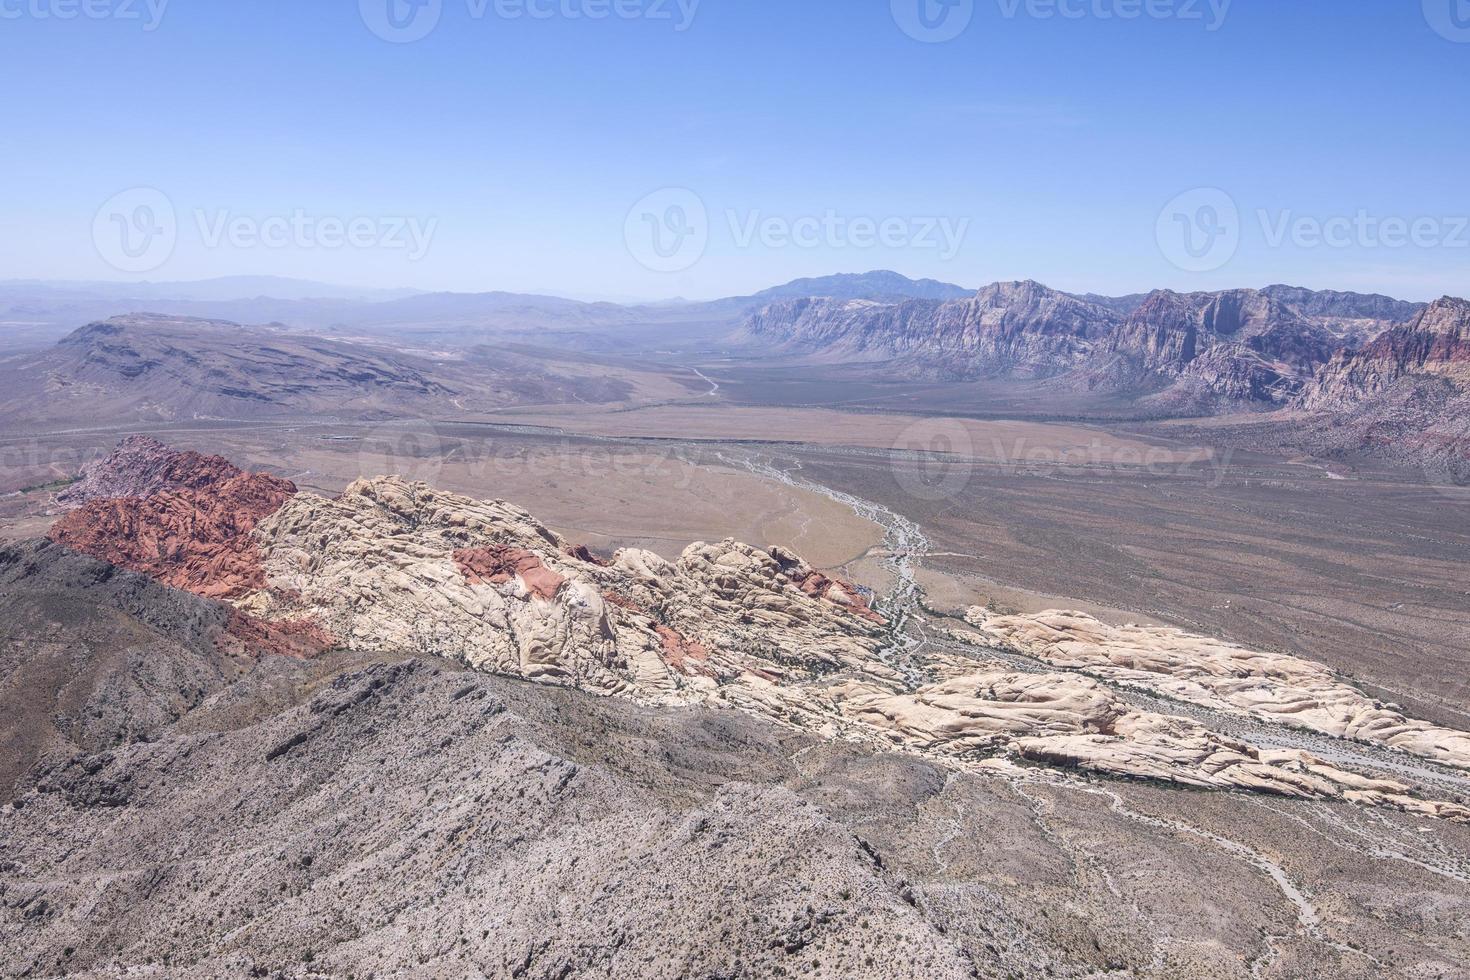 Red Rock Canyon, Nevada Scenic hoge hoekmening foto